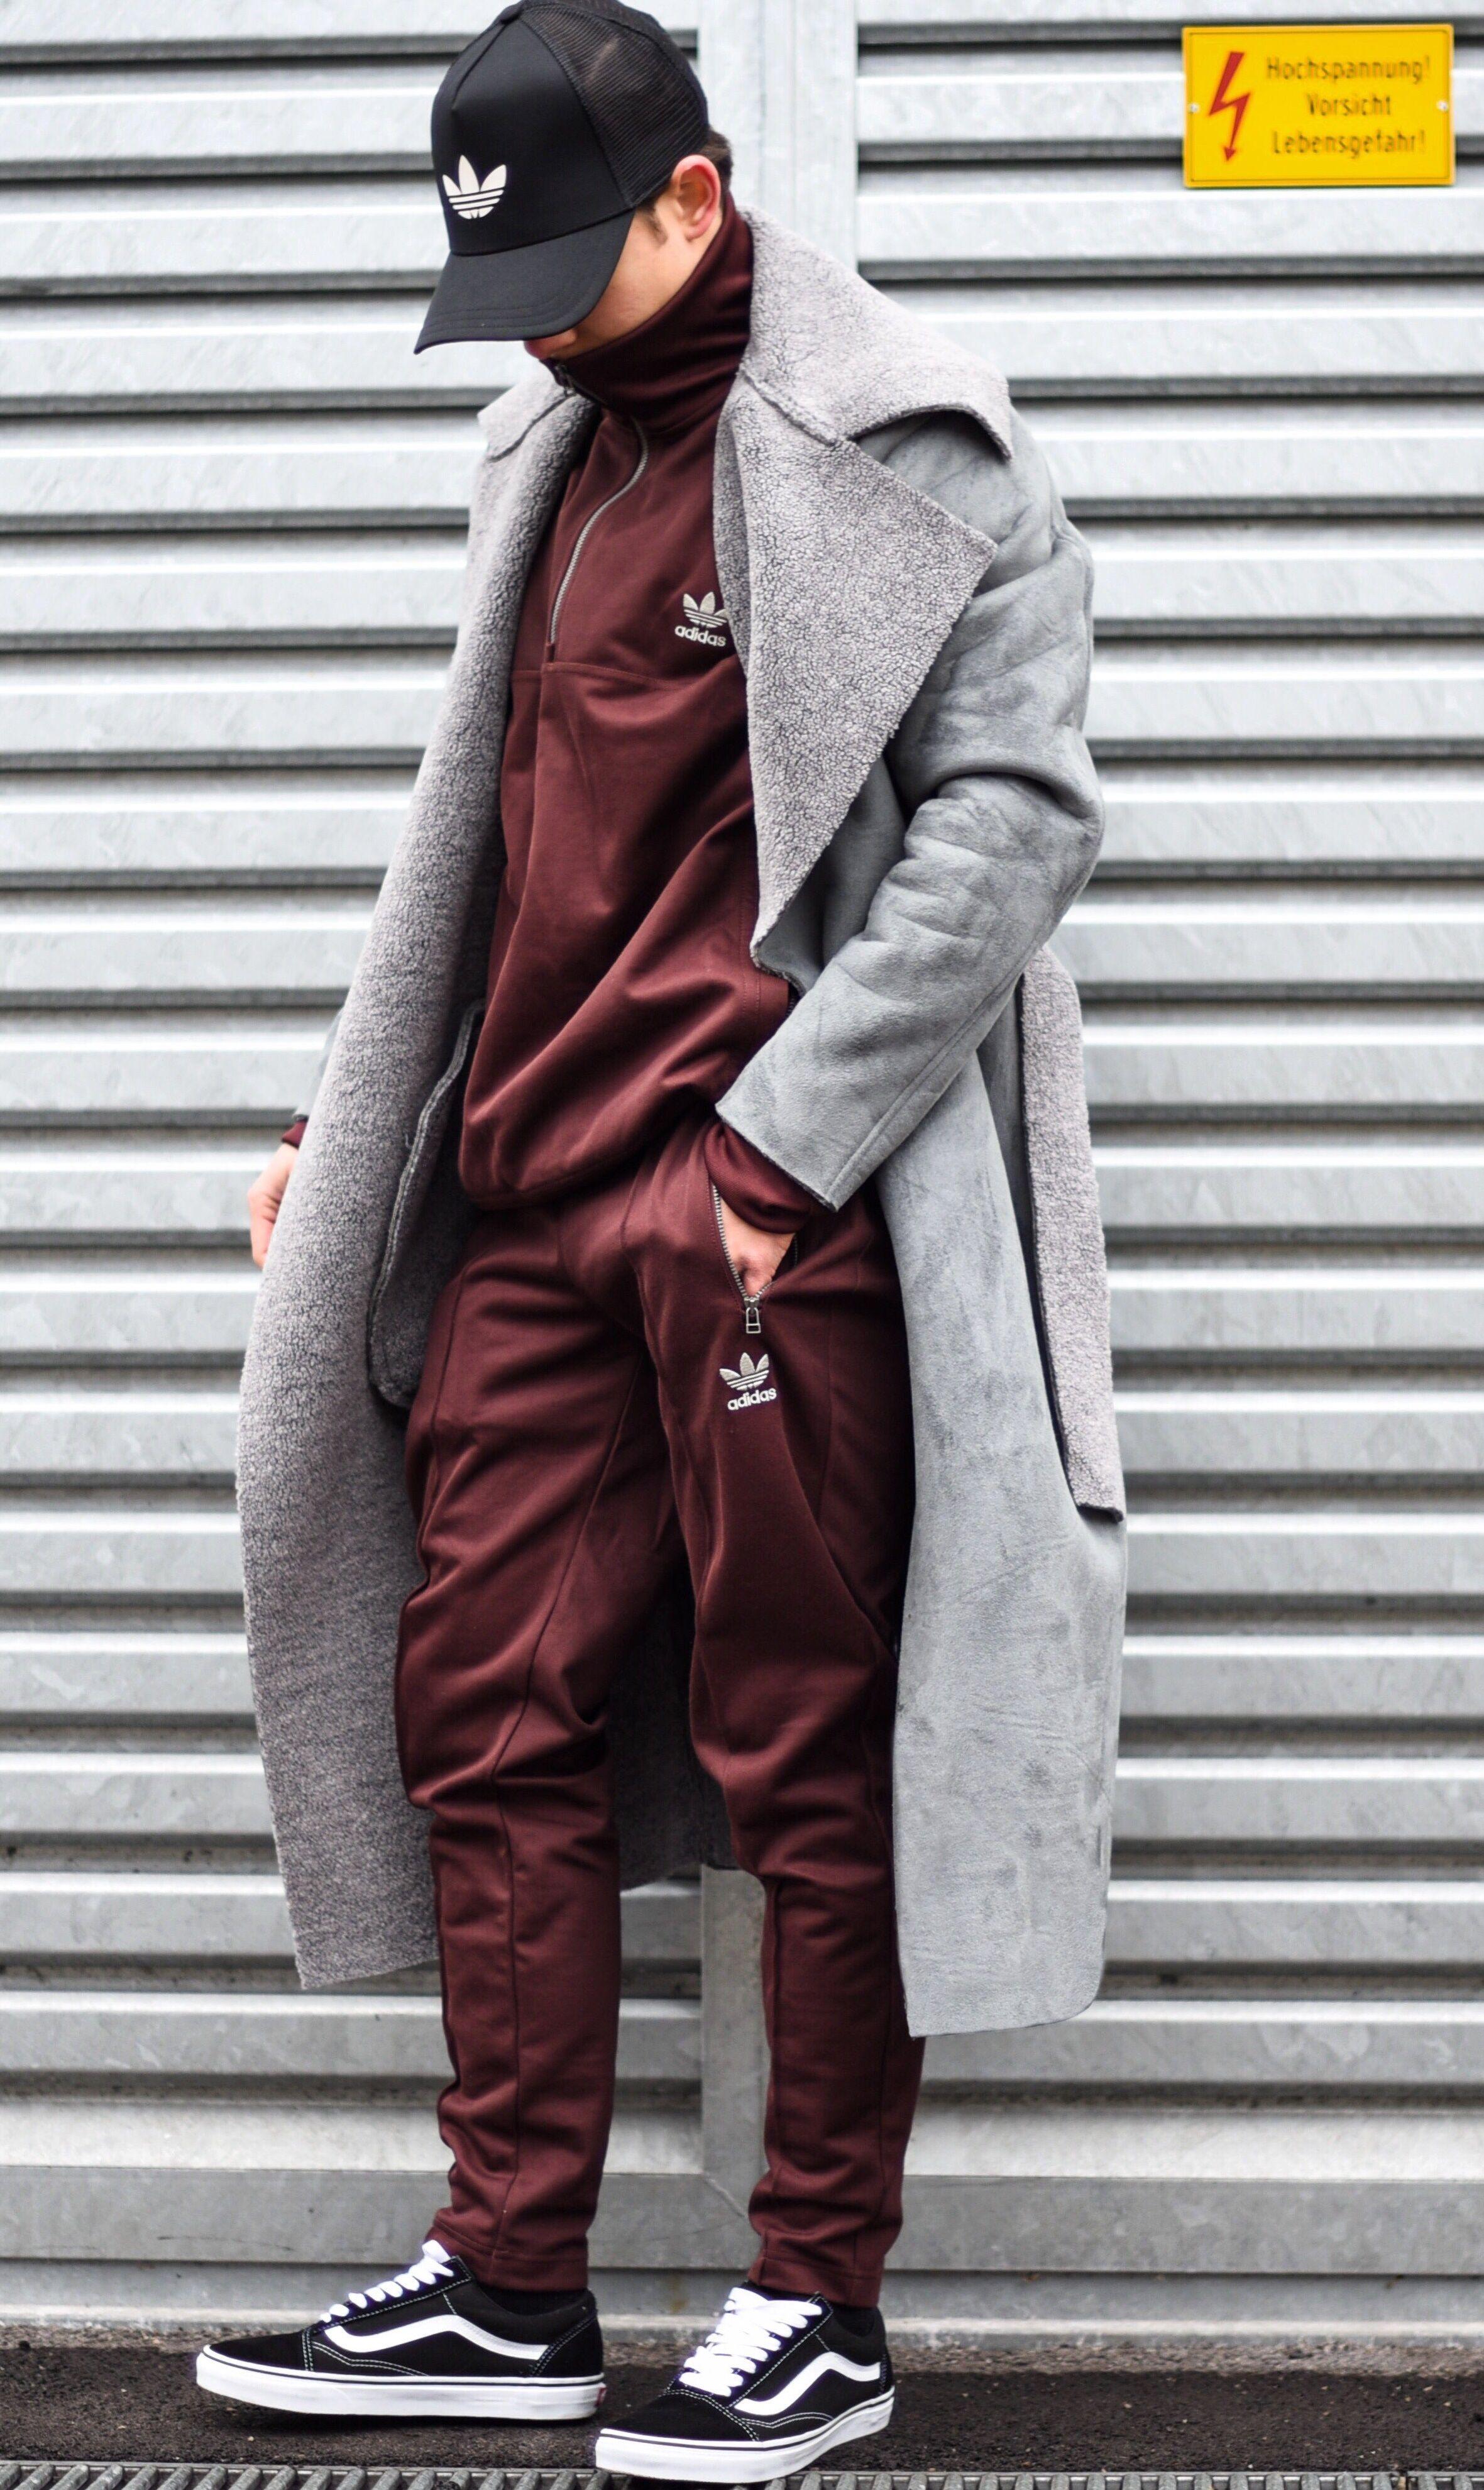 adidas burgundy sweatsuit